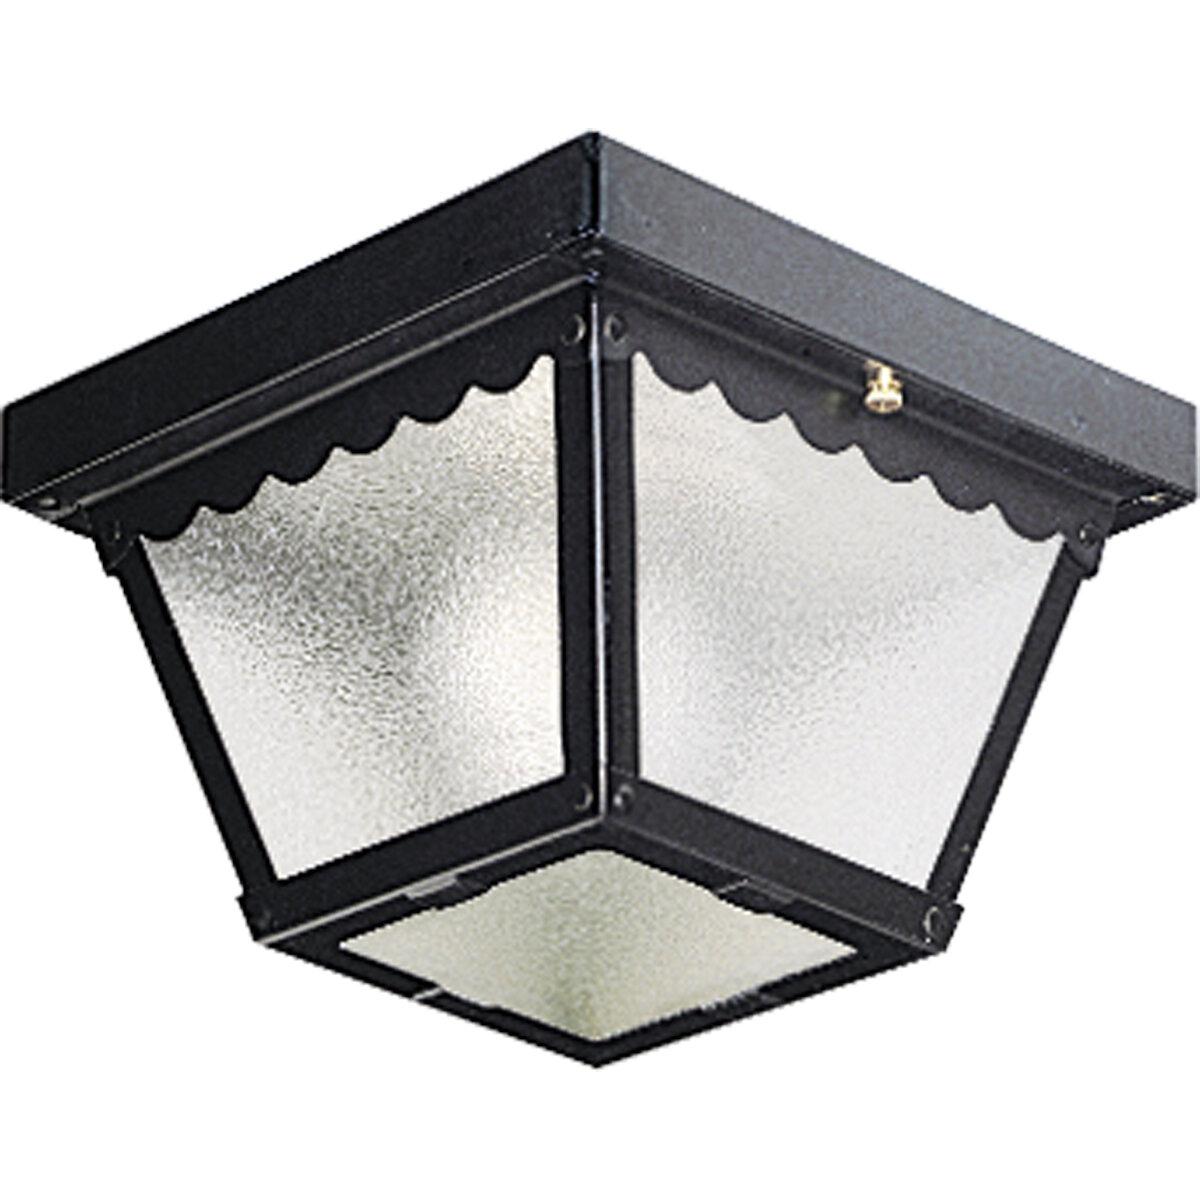 Ceiling Flush Mount Steel Commercial Outdoor Lighting You Ll Love In 2021 Wayfair